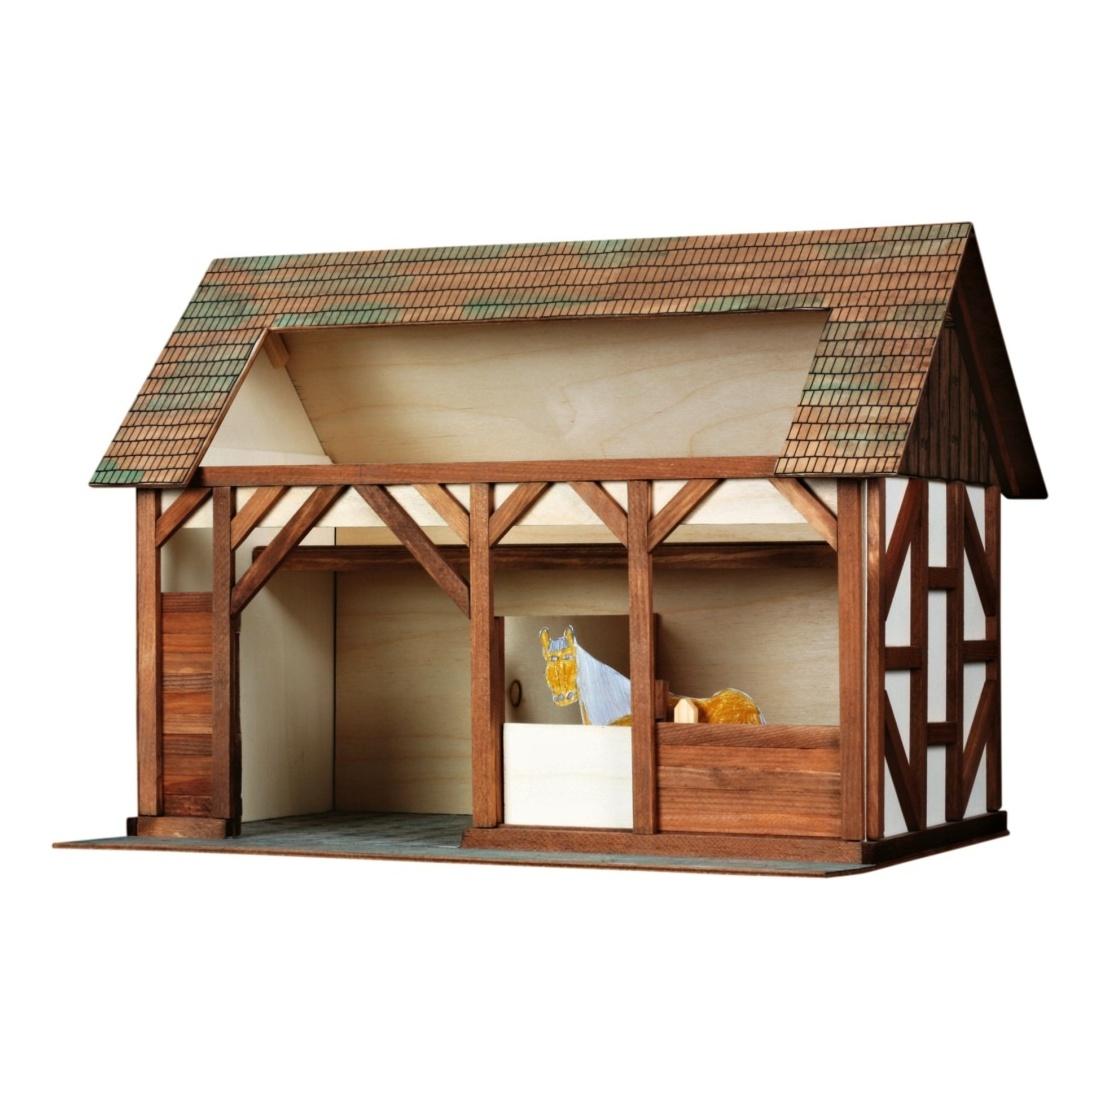 Walachia Dřevěná slepovací stavebnice Stáj